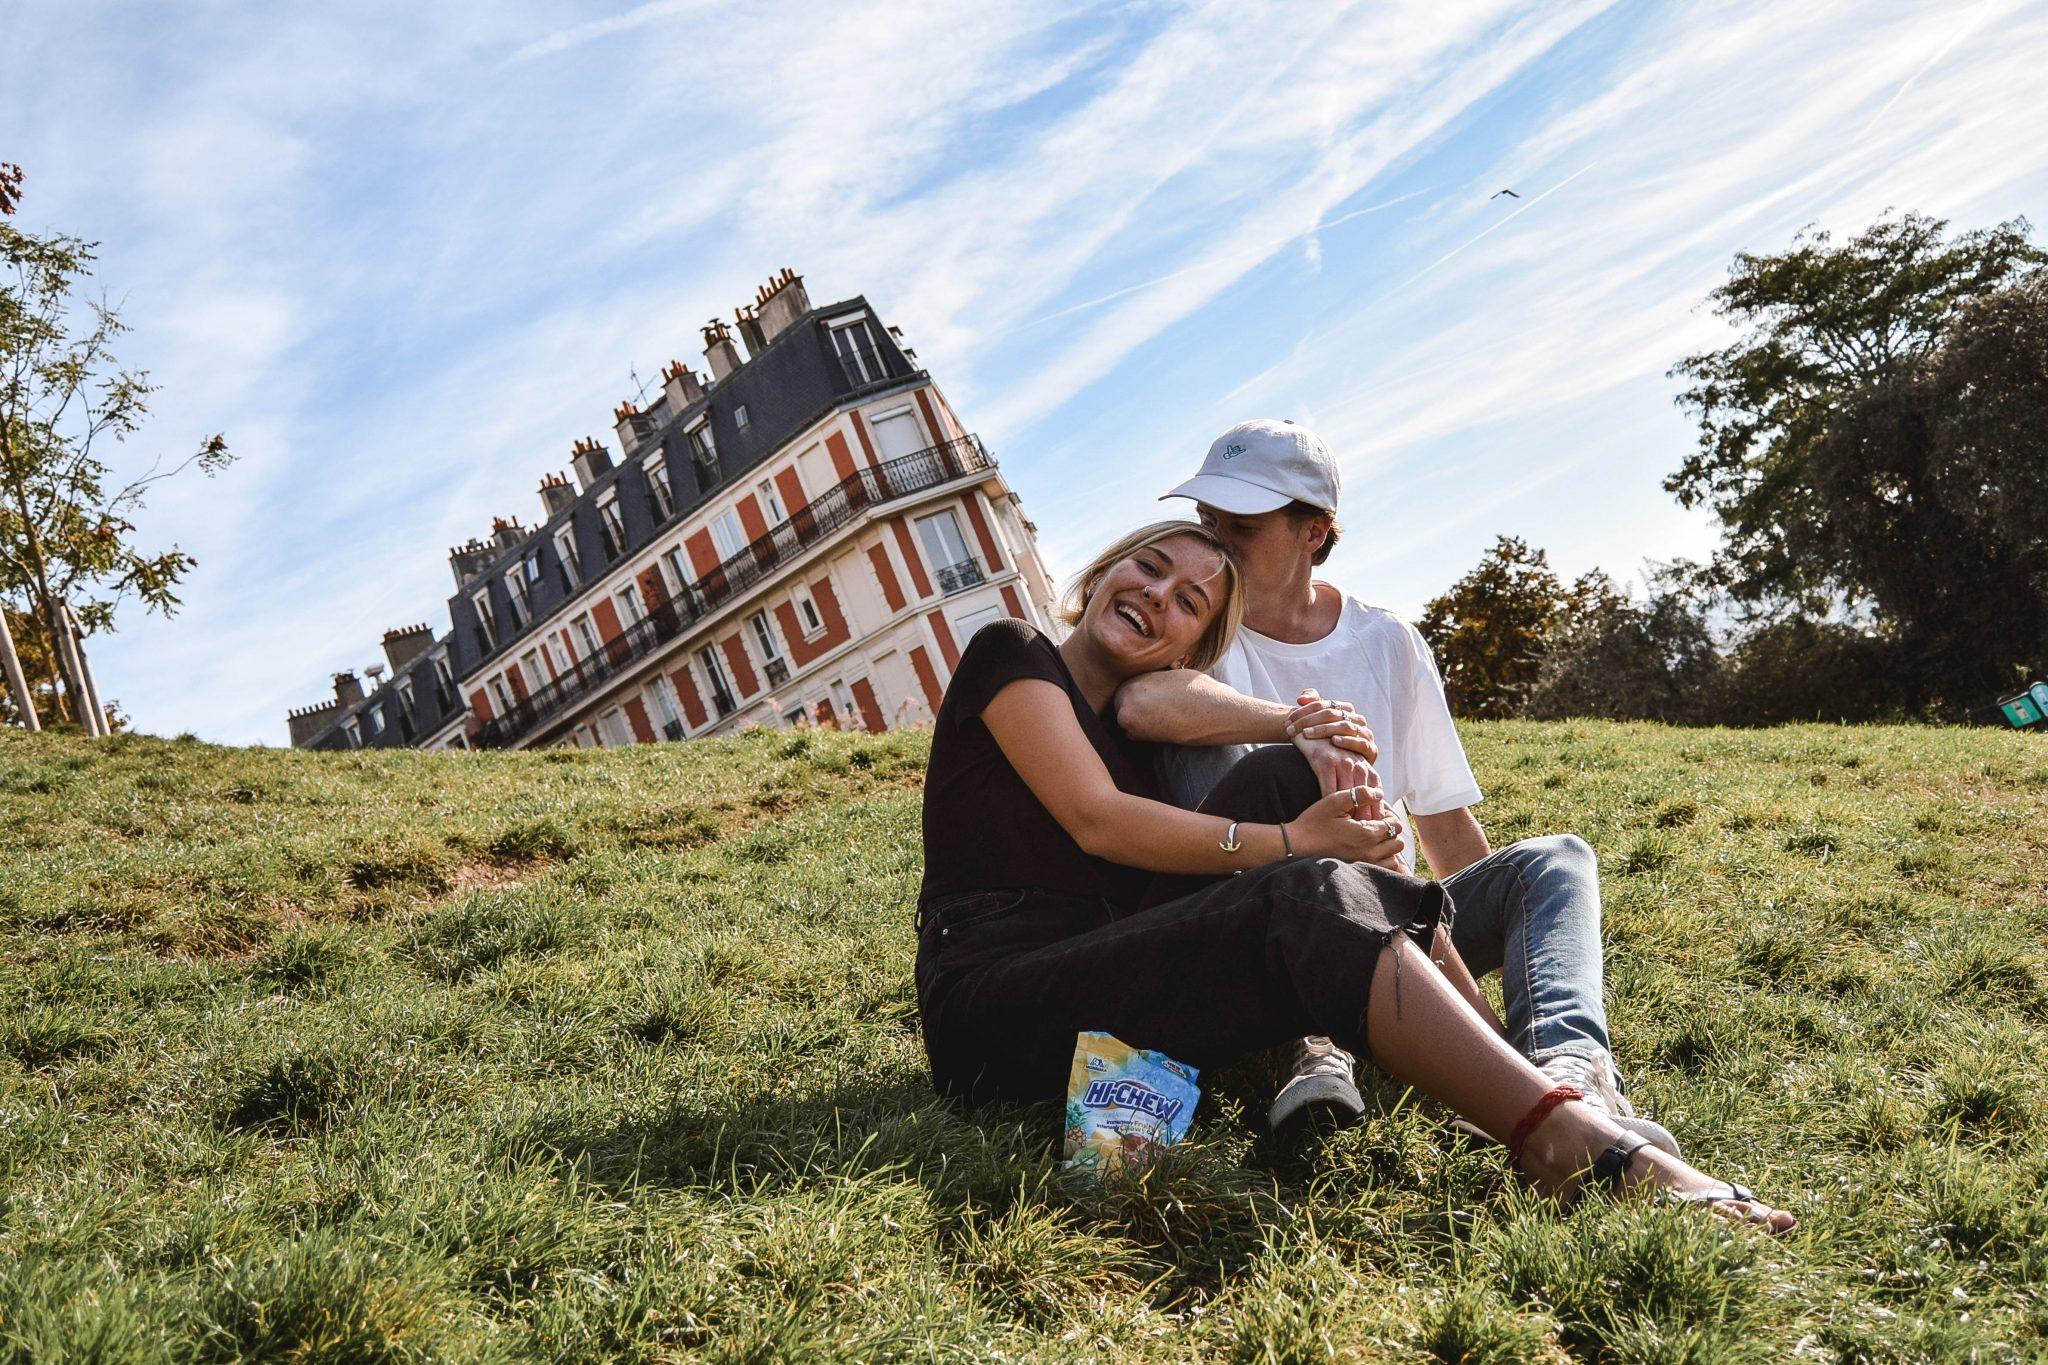 Wanderers & Warriors - Charlie & Lauren UK Travel Couple - Two Days In Paris Itinerary - Sinking House Paris